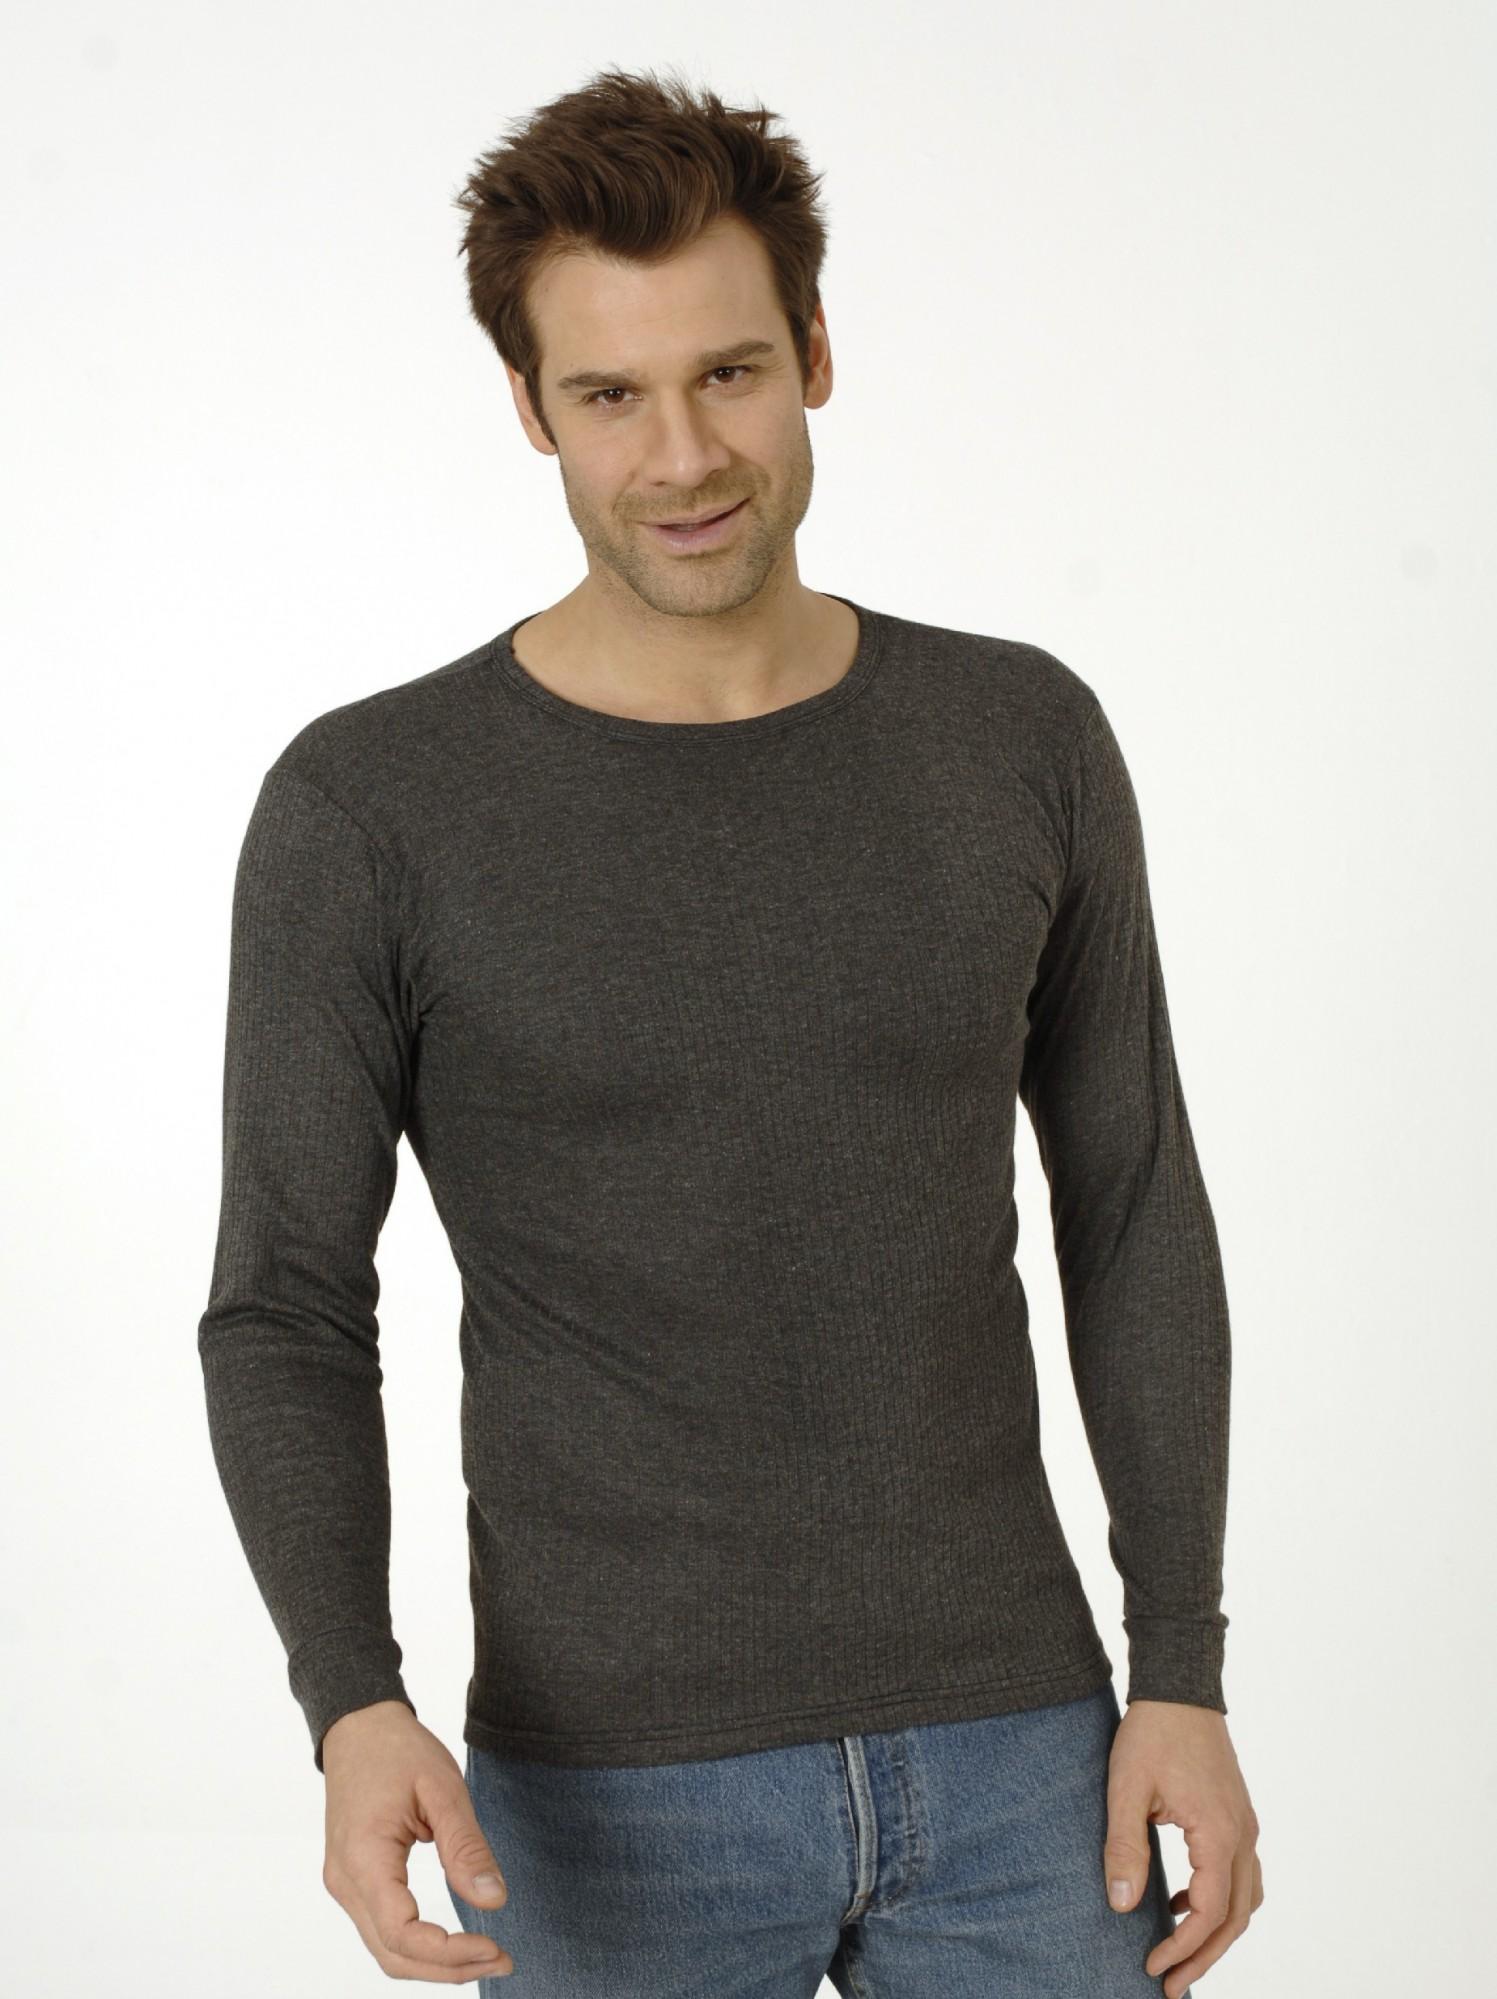 Herren Thermo Unterhemd, 1/1-Arm, langarm, 17003 – Bild 1